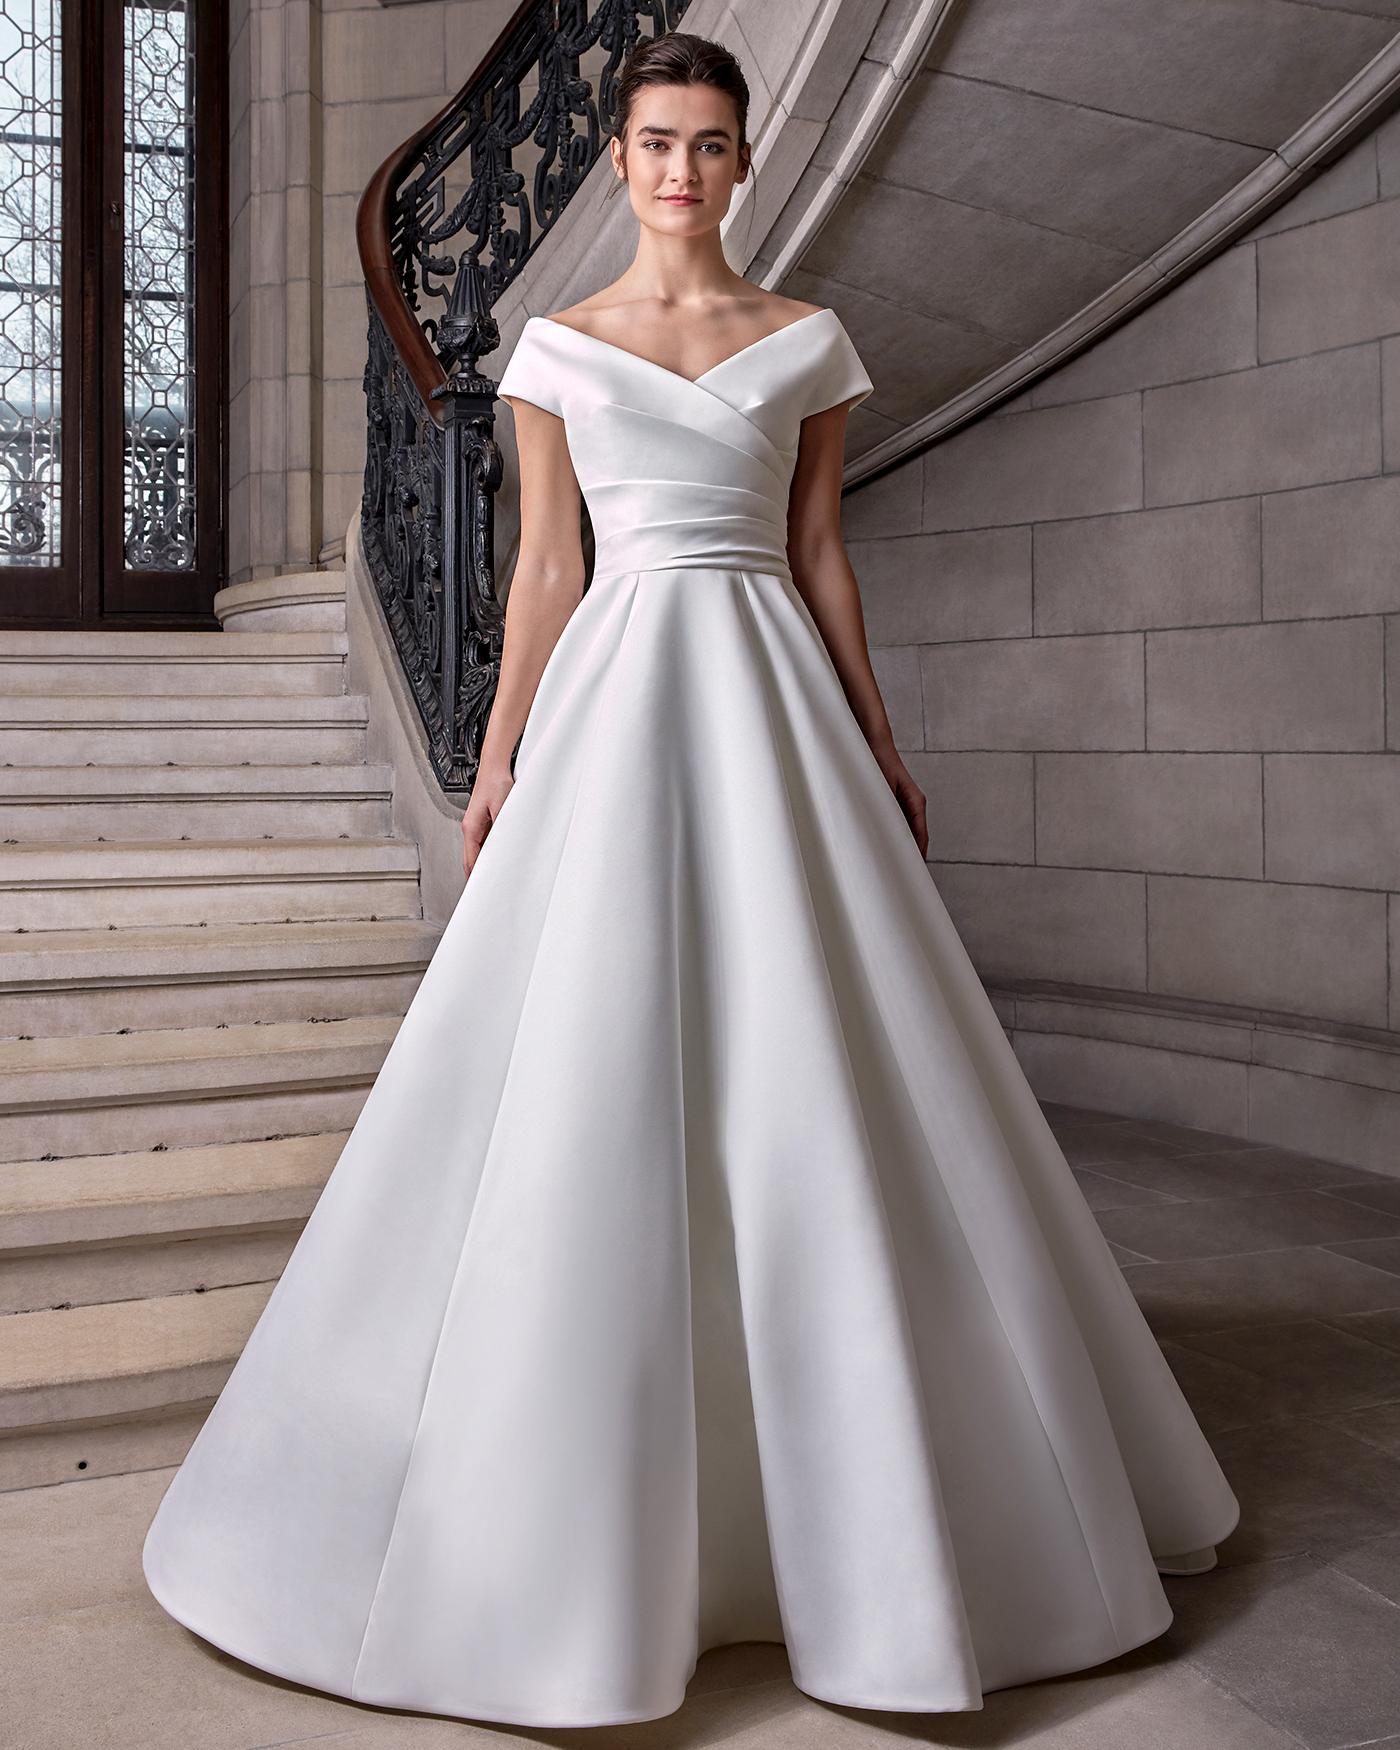 sareh nouri off the shoulder ball gown wedding dress spring 2020